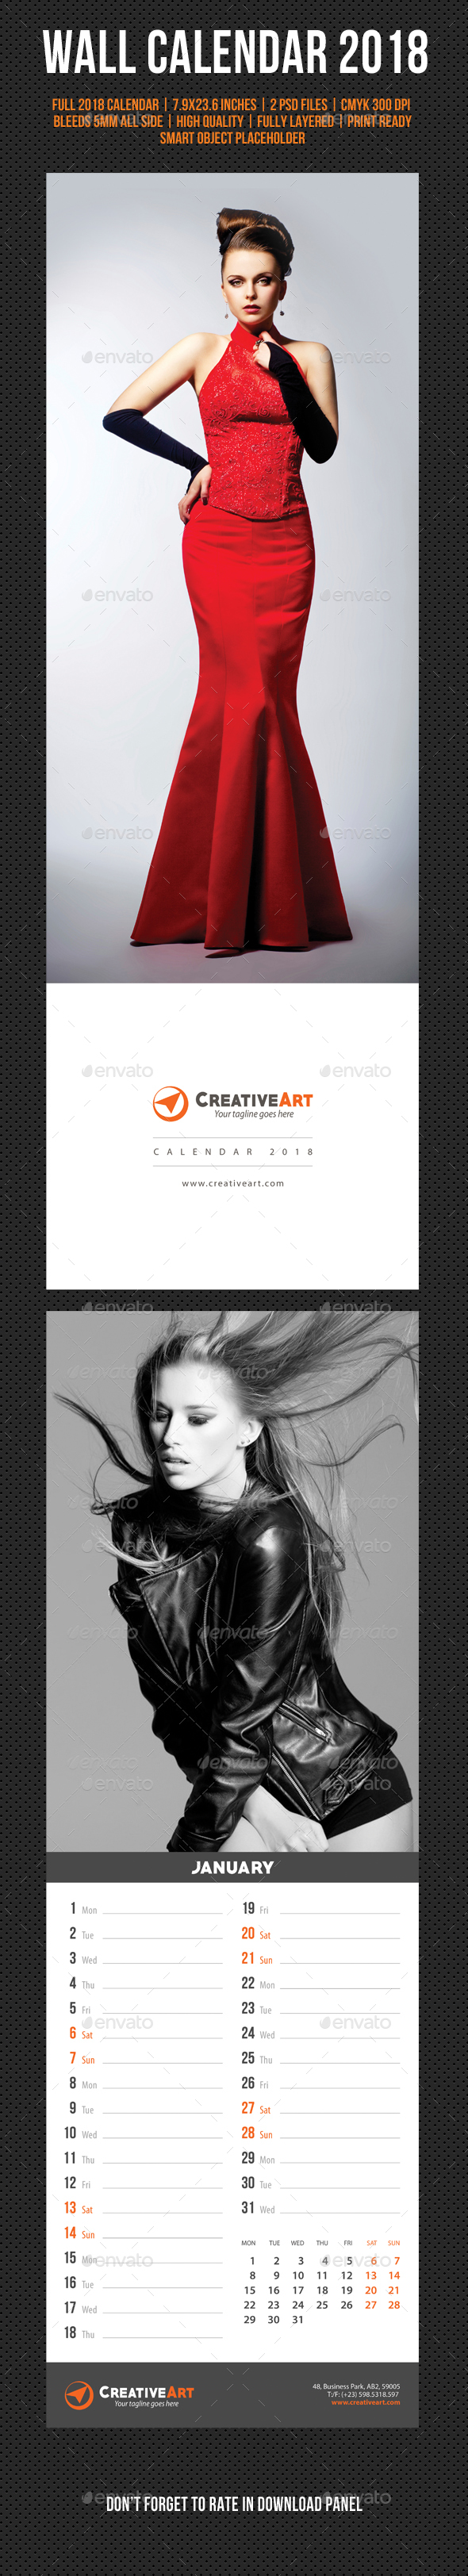 Creative Wall Calendar 2018 V05 - Calendars Stationery